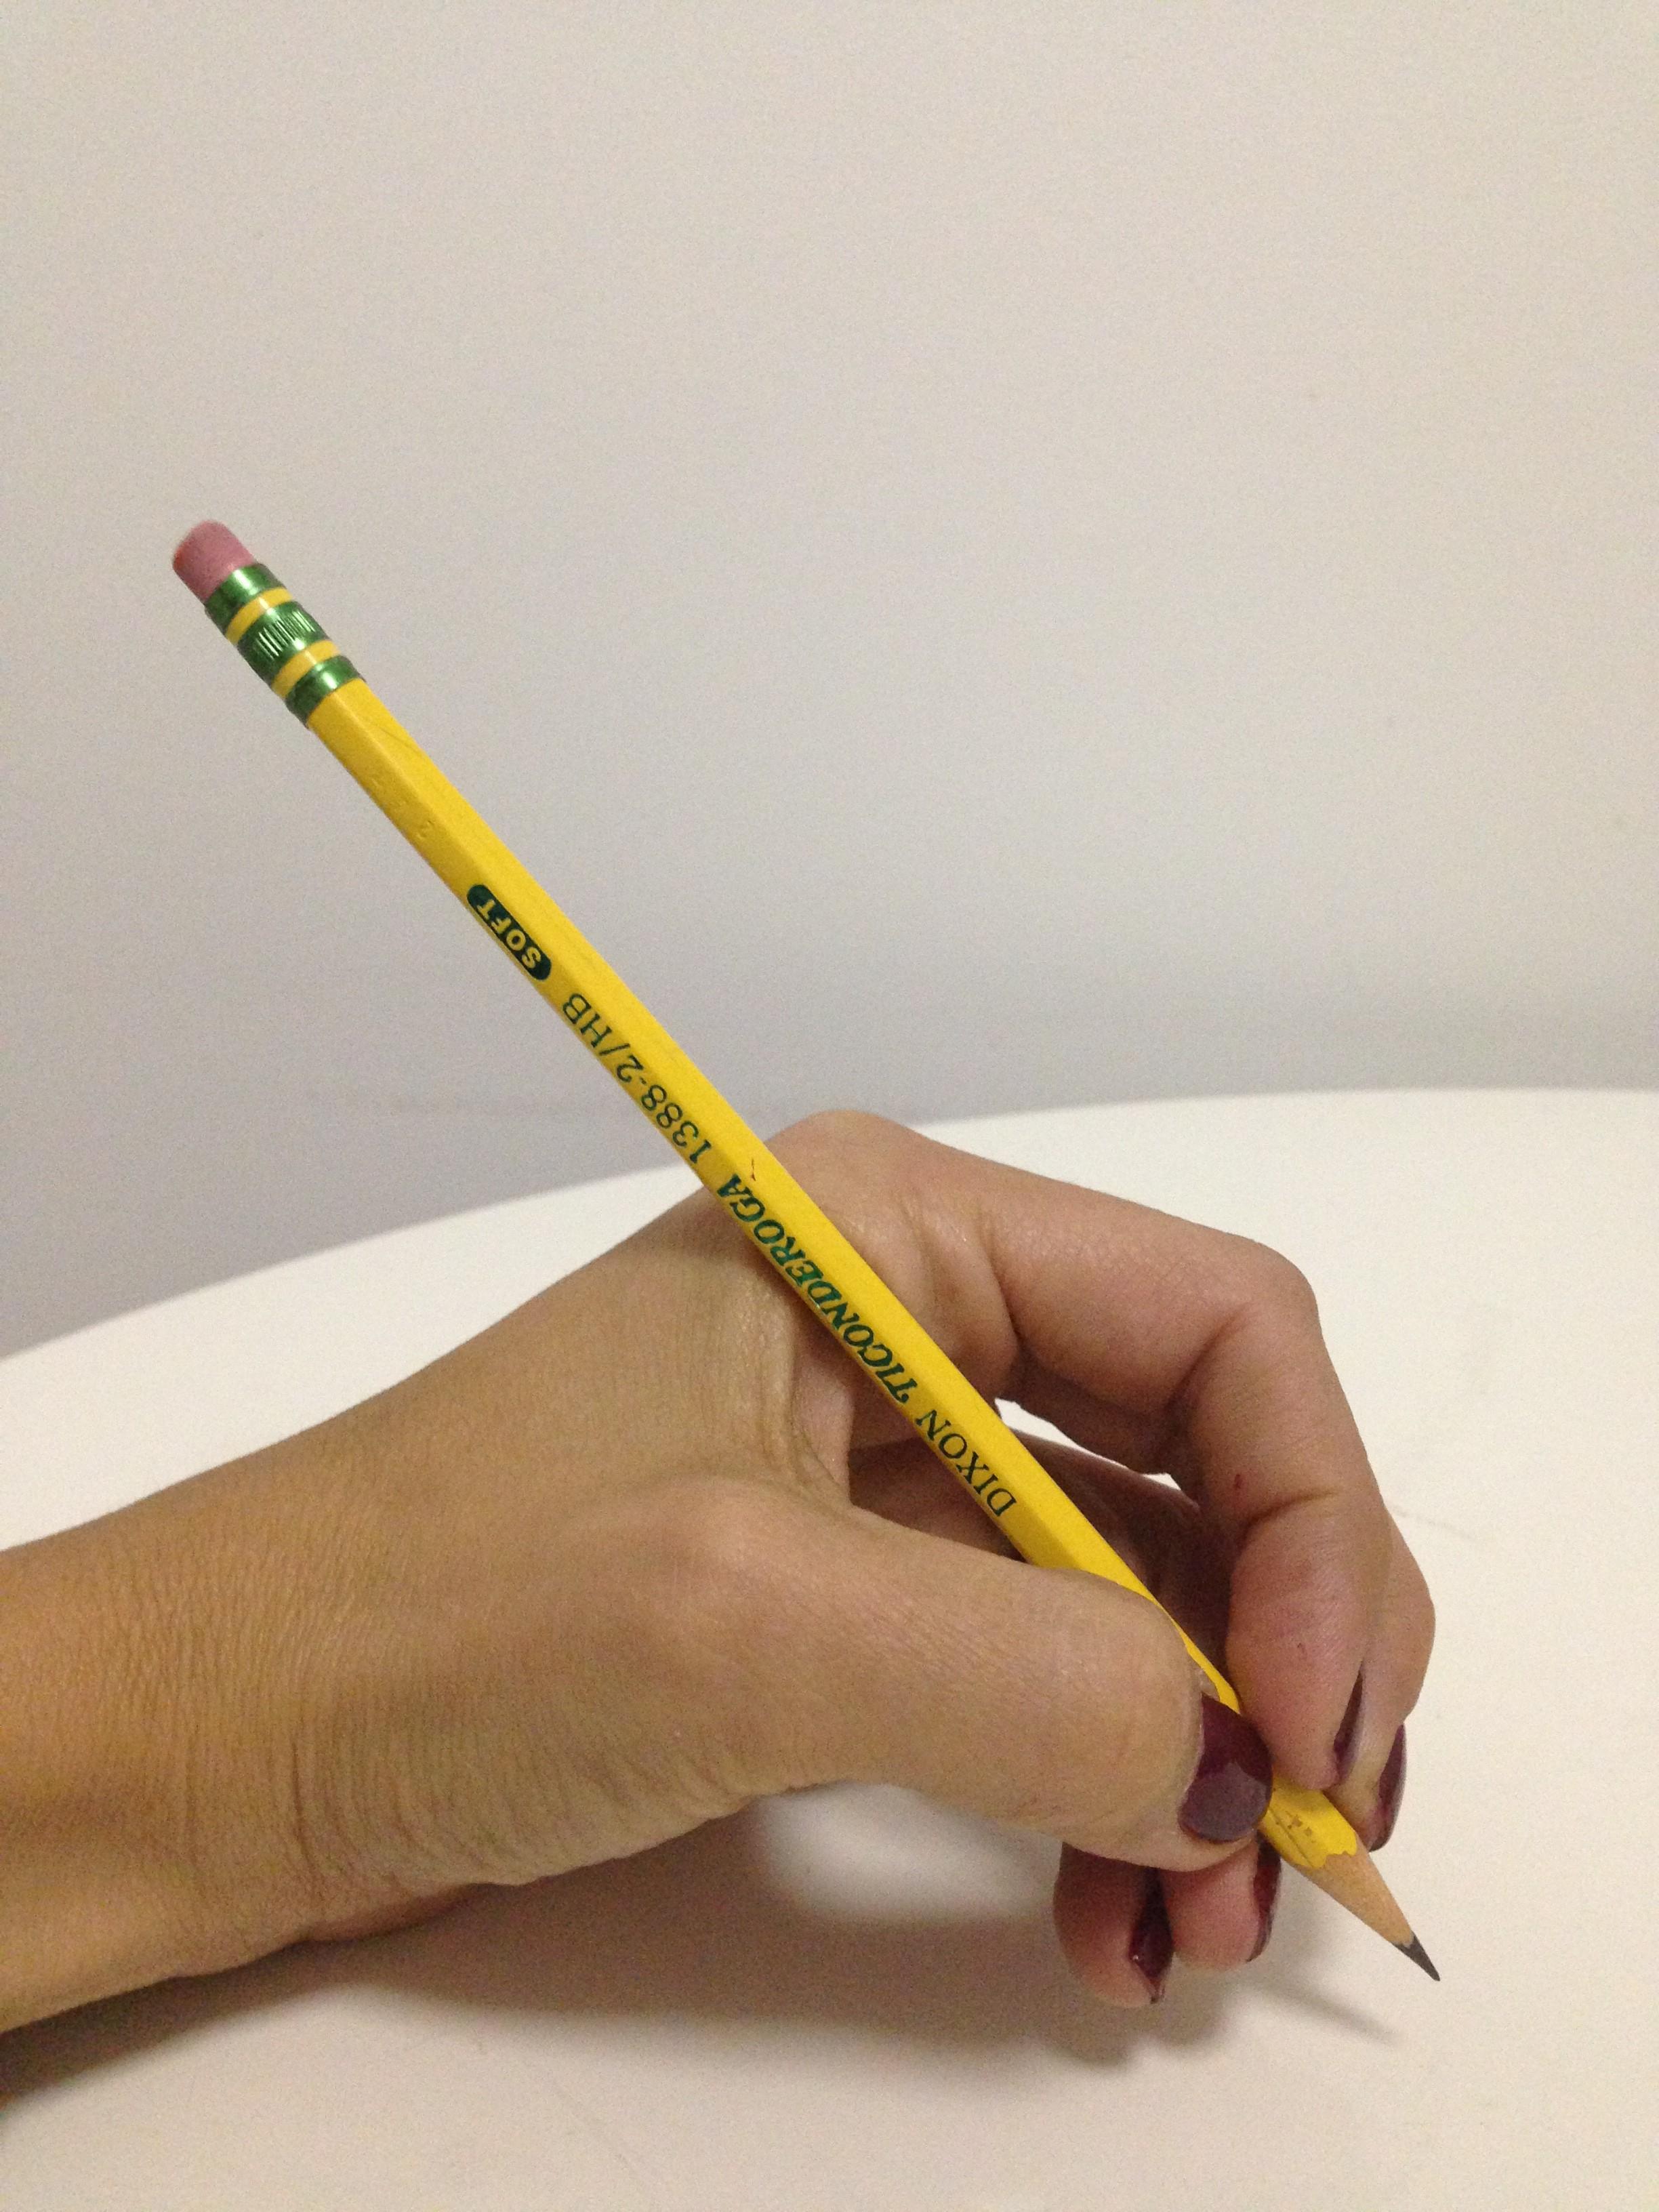 Kindergarten Admissions Interview: The Write Grasp